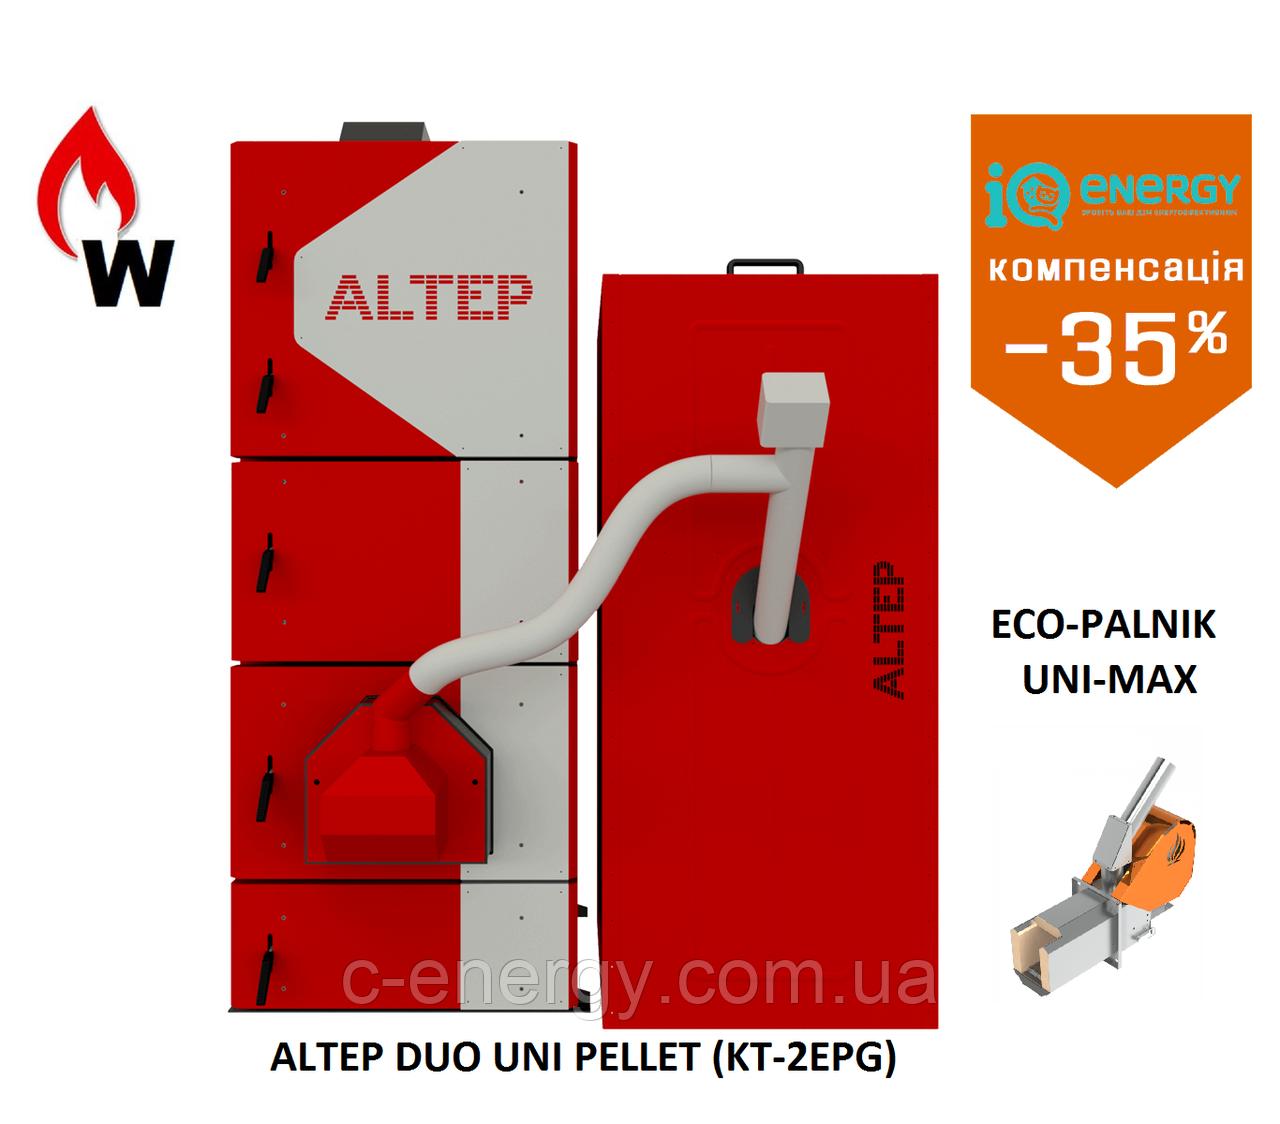 Пелетный котел Altep Duo Uni Pellet  95 кВт (KT-2EPG) + Eco-Palnik Uni-MAX, фото 1